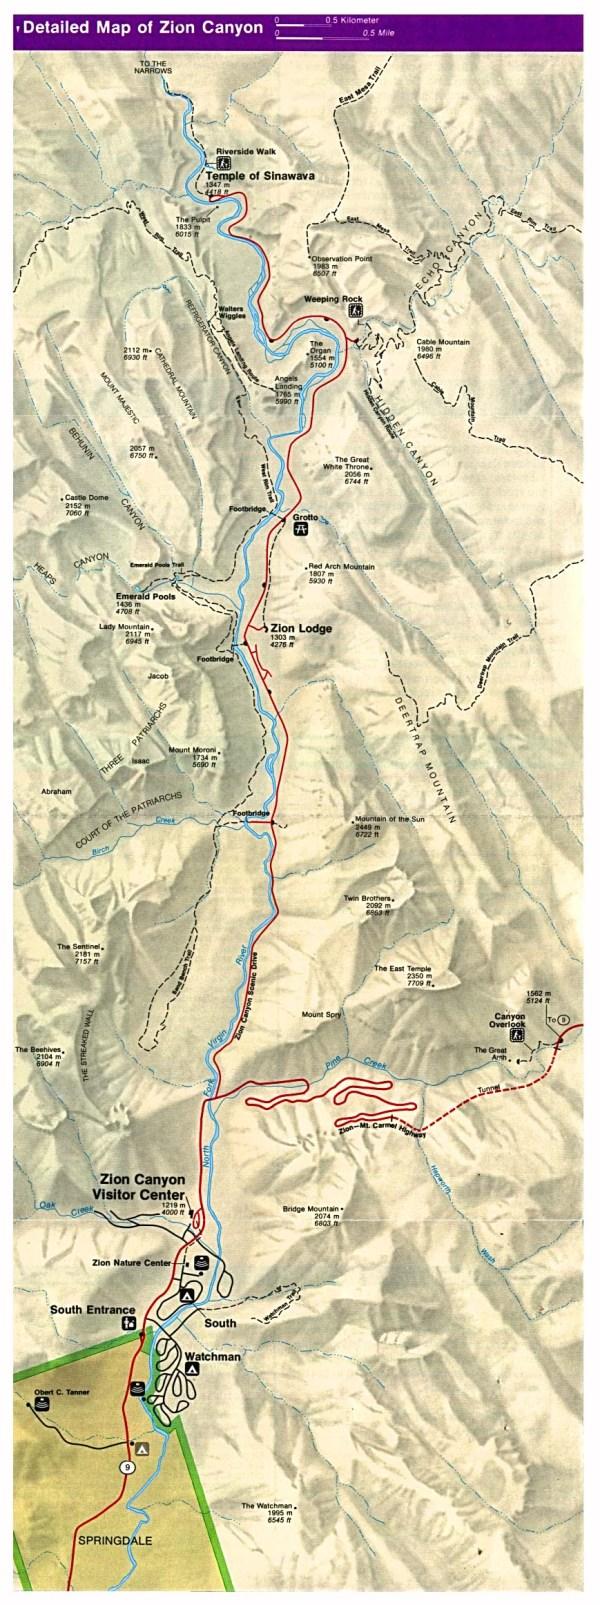 Zion Canyon Map Zion National Park UT USA mappery